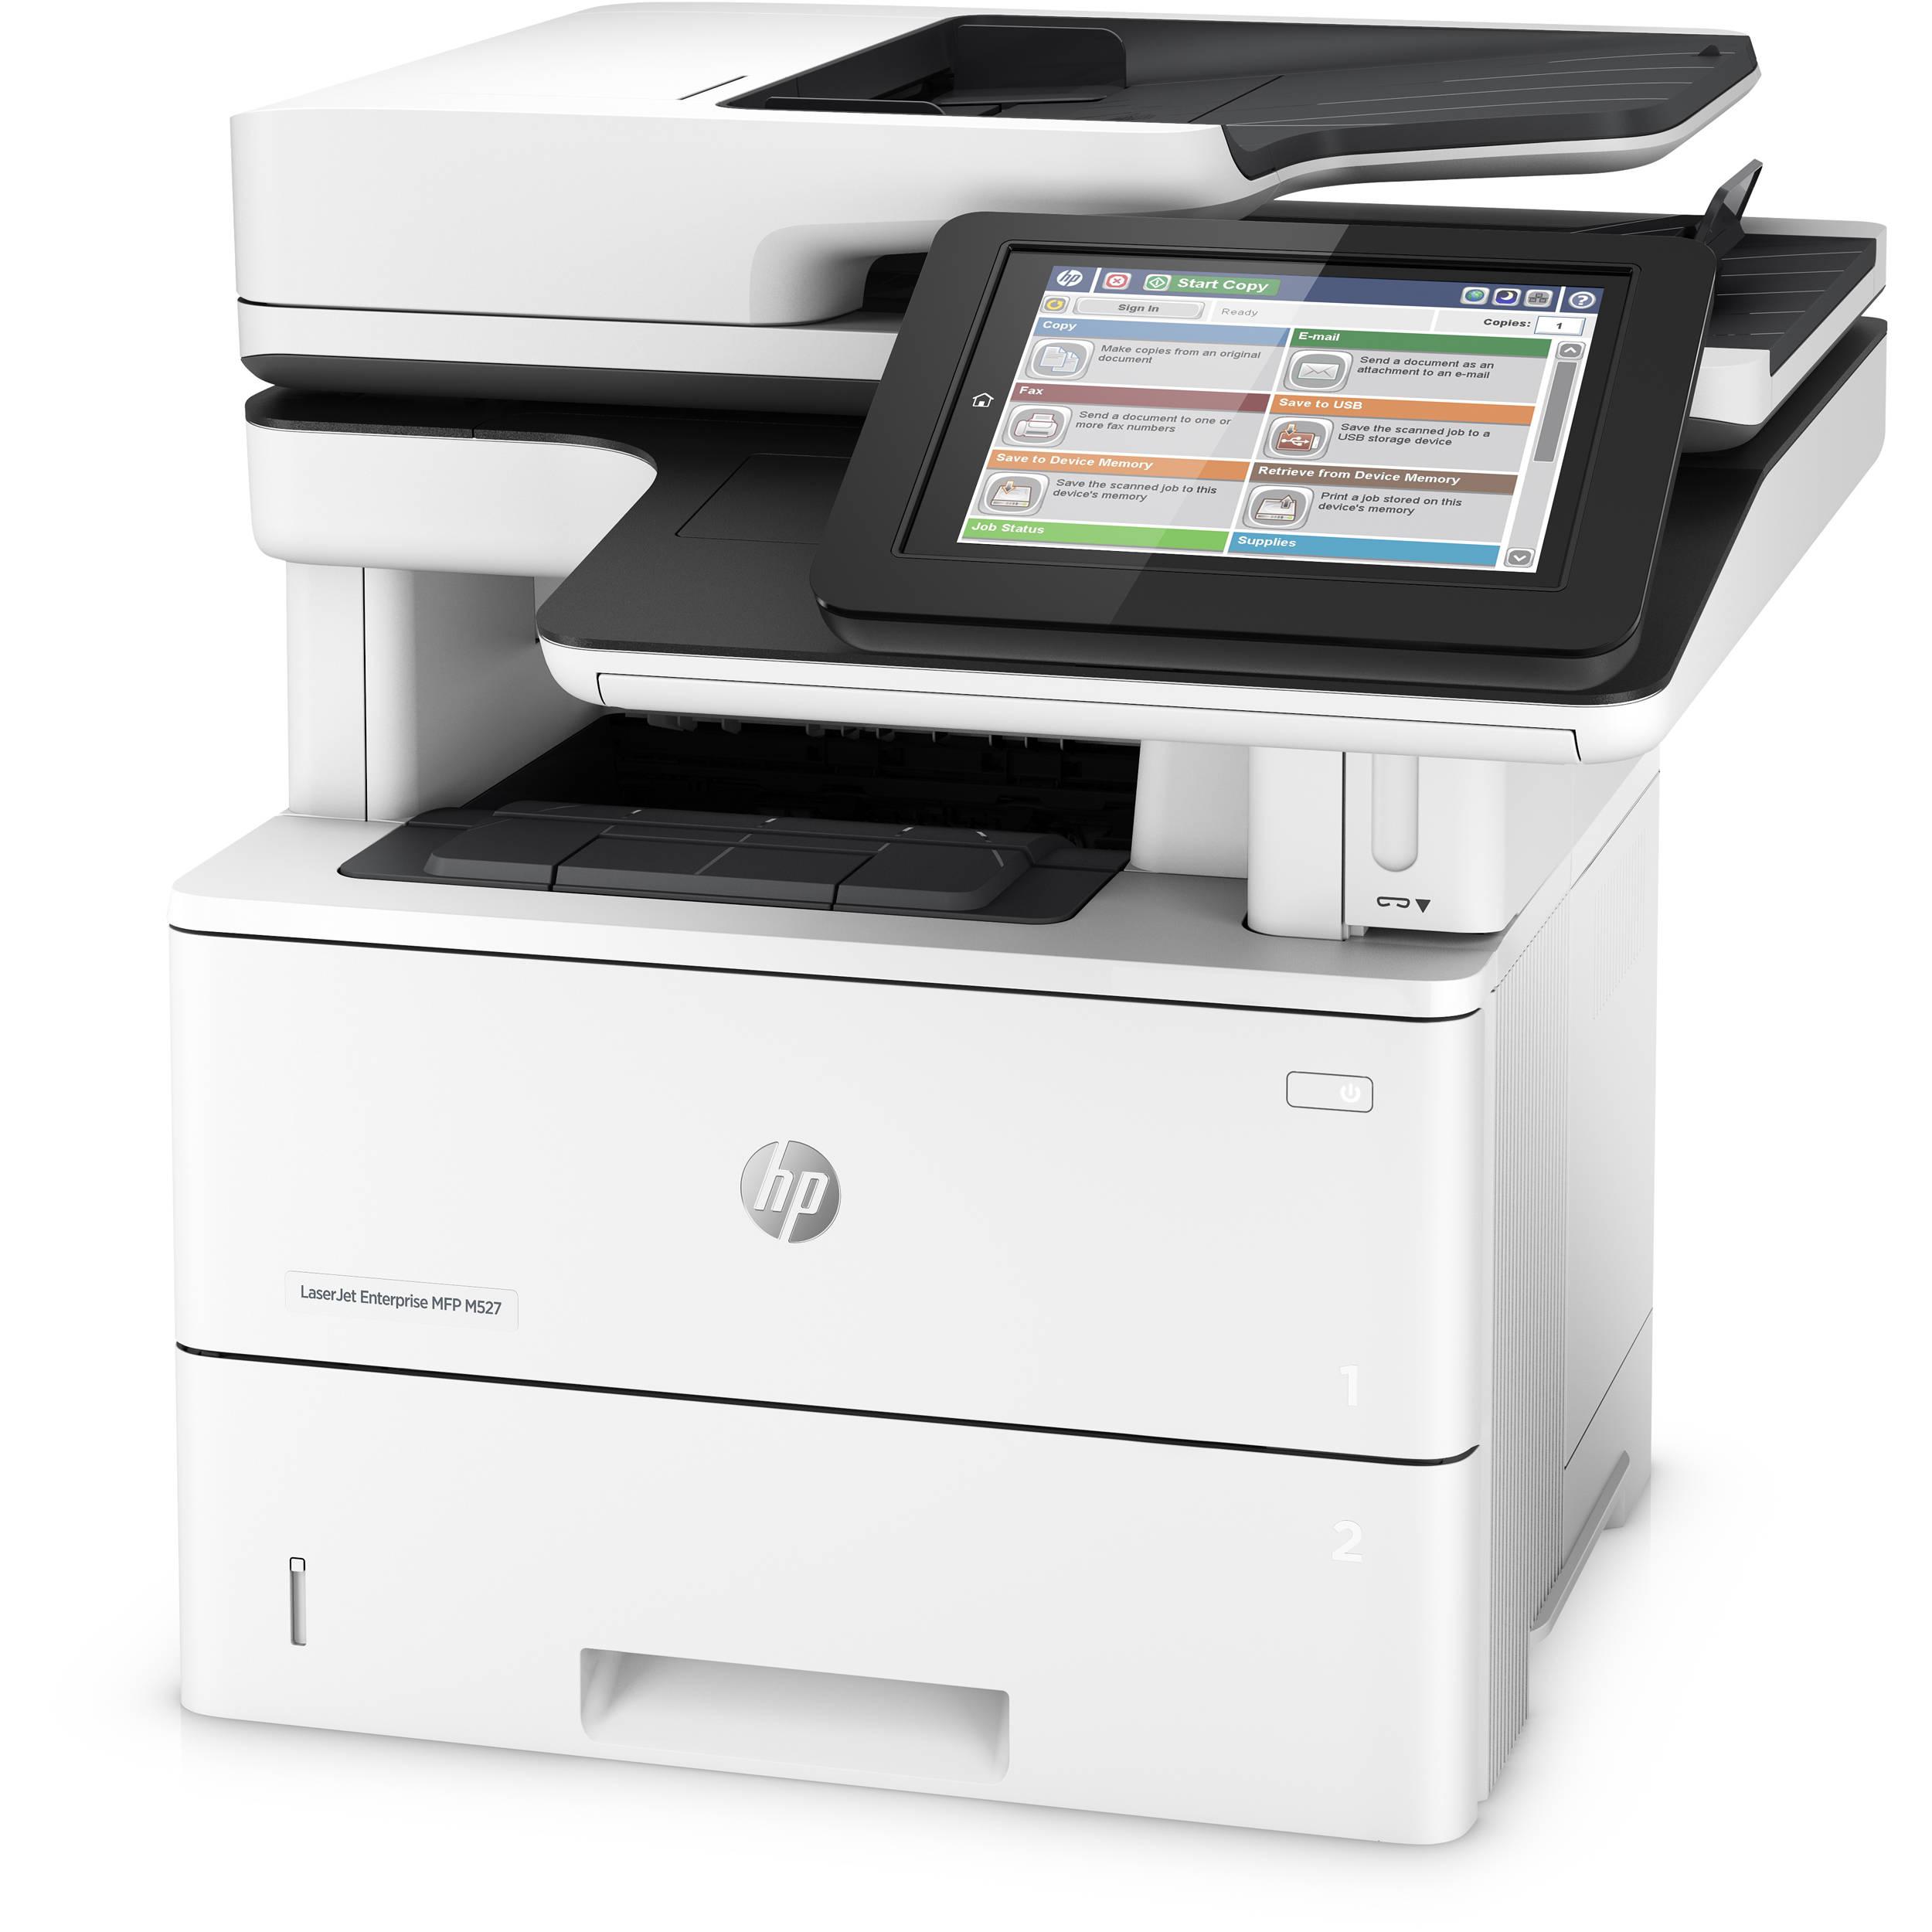 HP LaserJet Enterprise Flow M527c All-in-One Monochrome Laser Printer